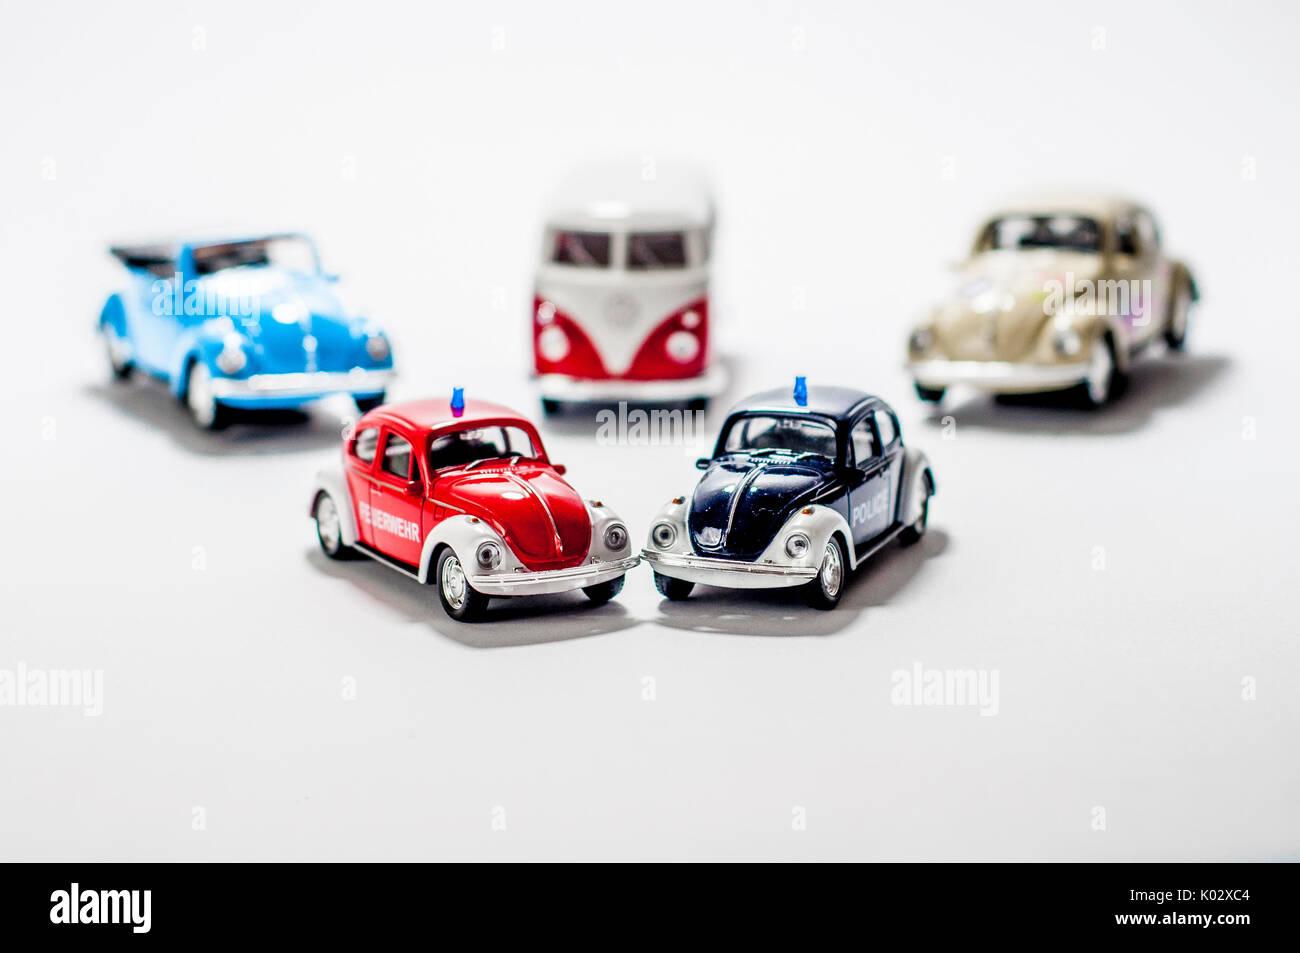 Classic VW old car, VW Beetle, VW T1, VW Bug, VW Kafer, Car model - Stock Image